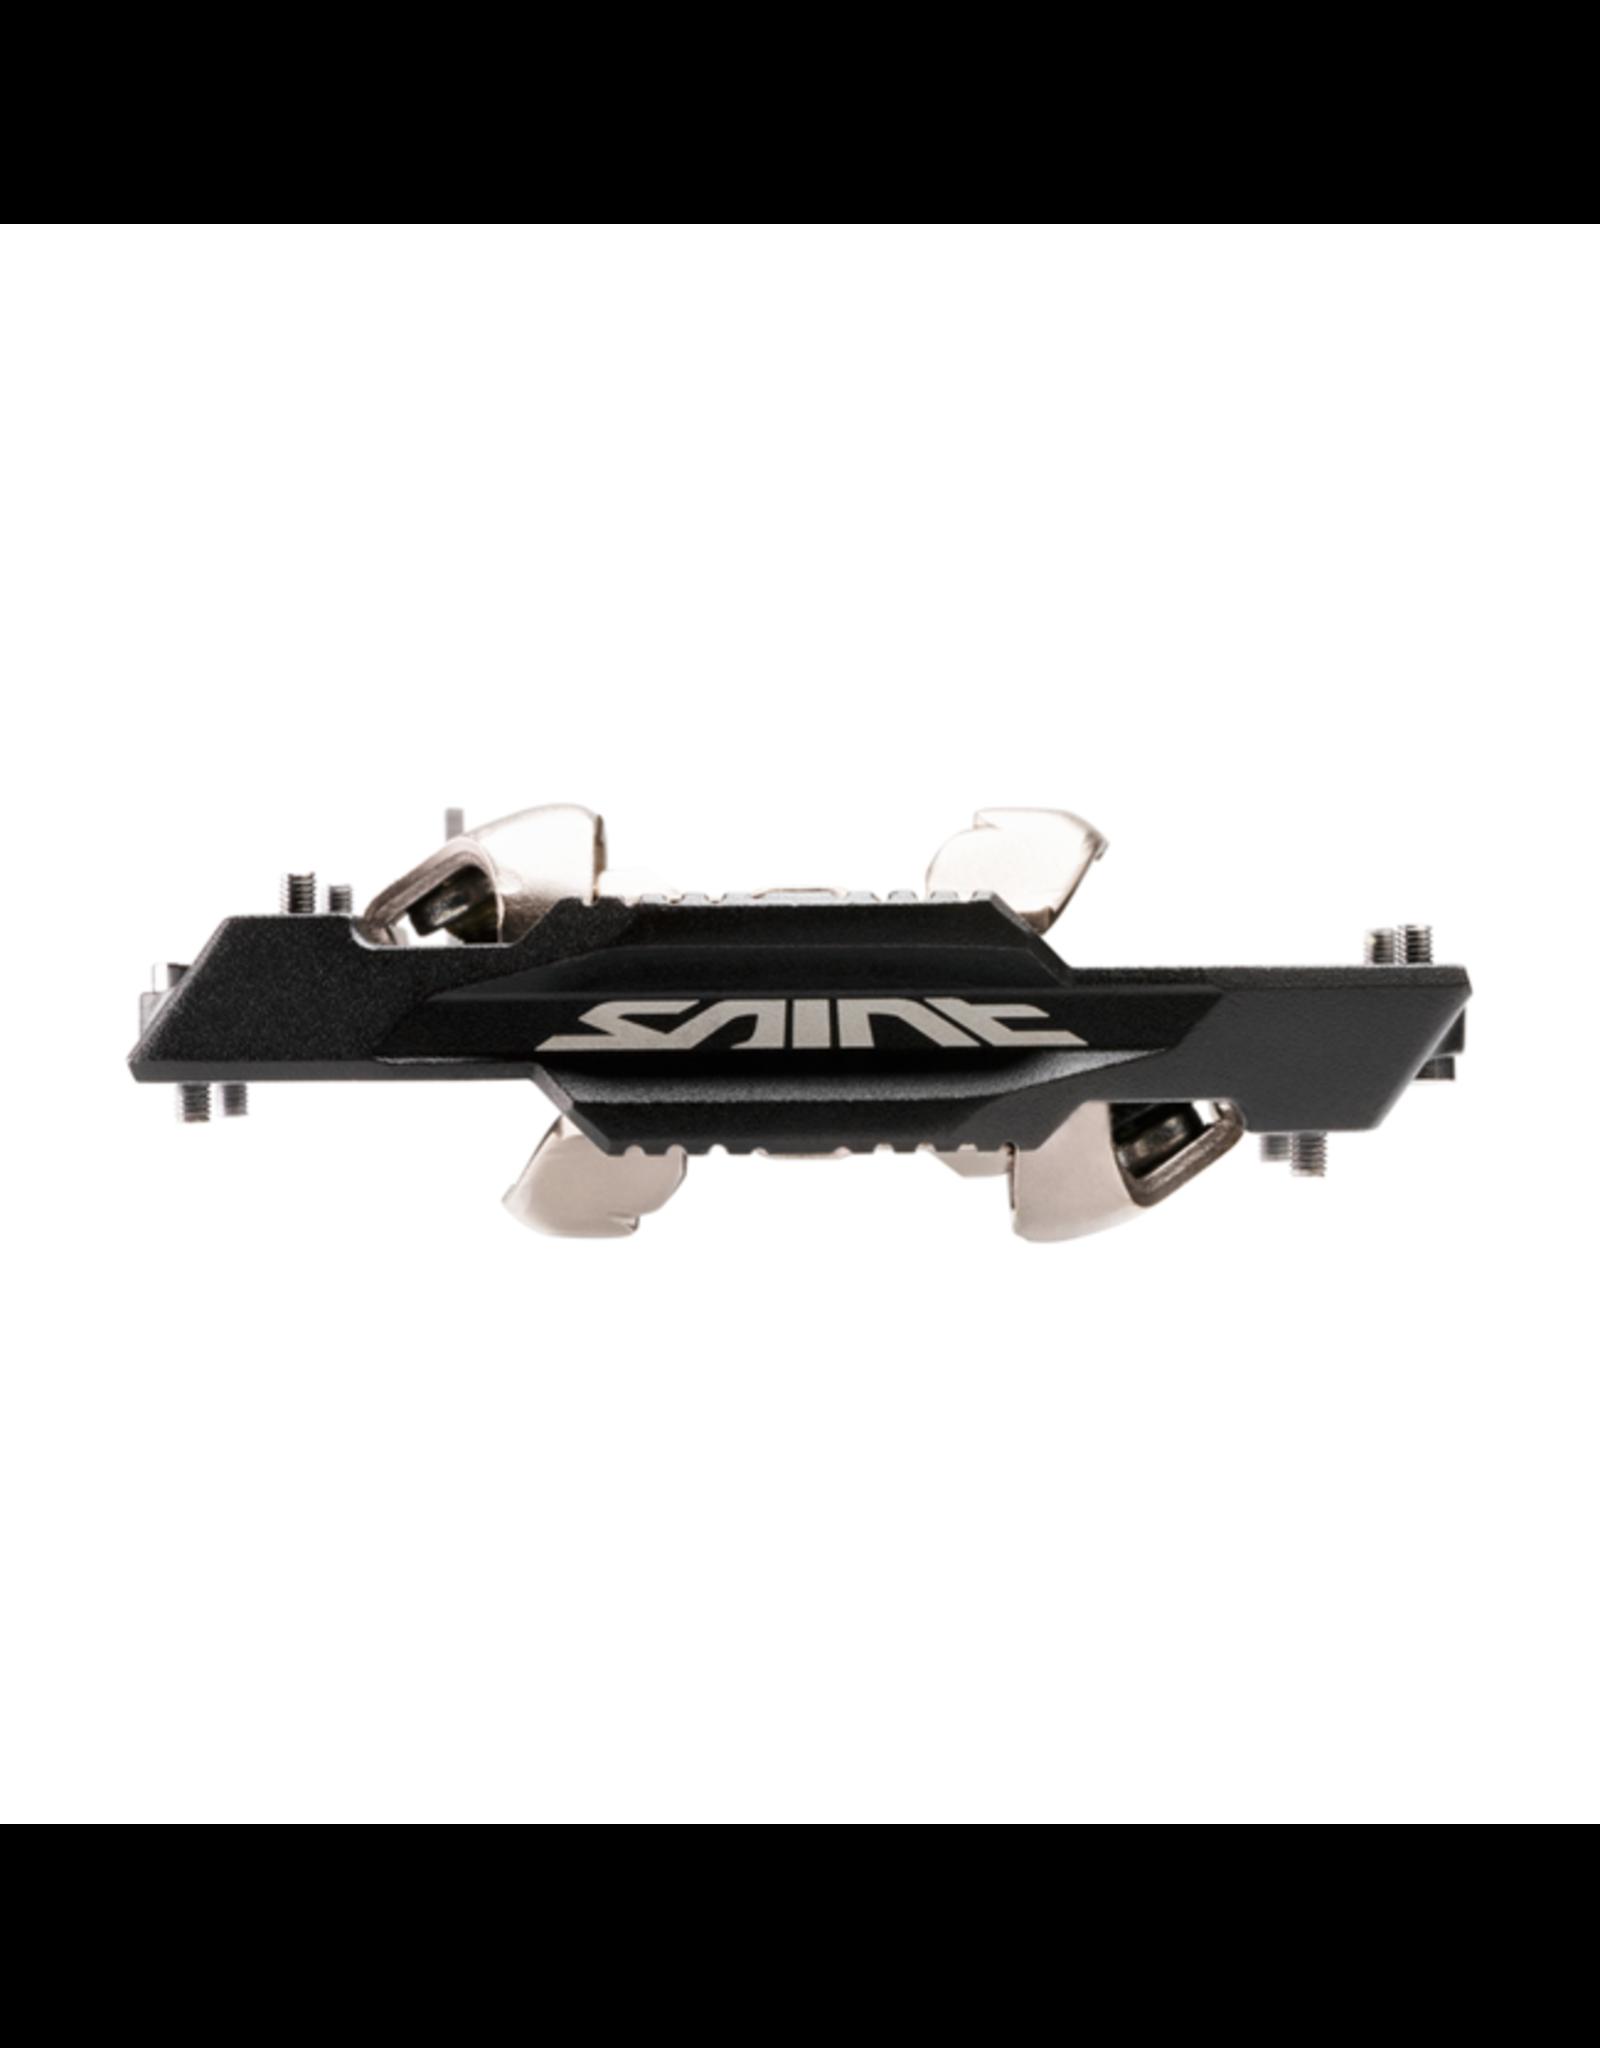 Shimano Shimano M820 Saint pedals